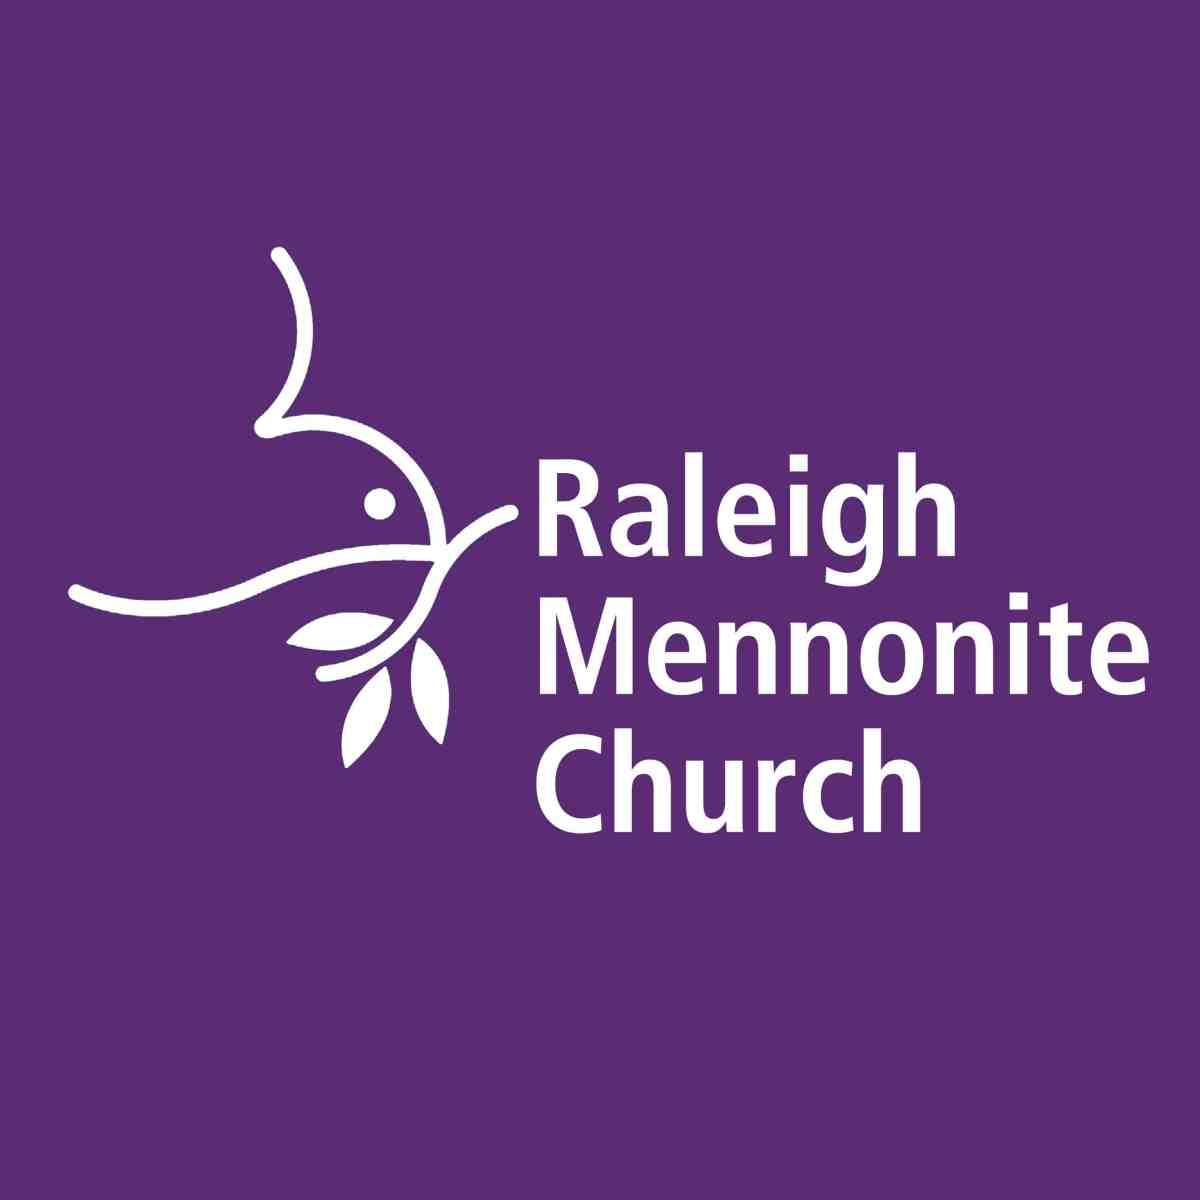 Raleigh Mennonite Church logo